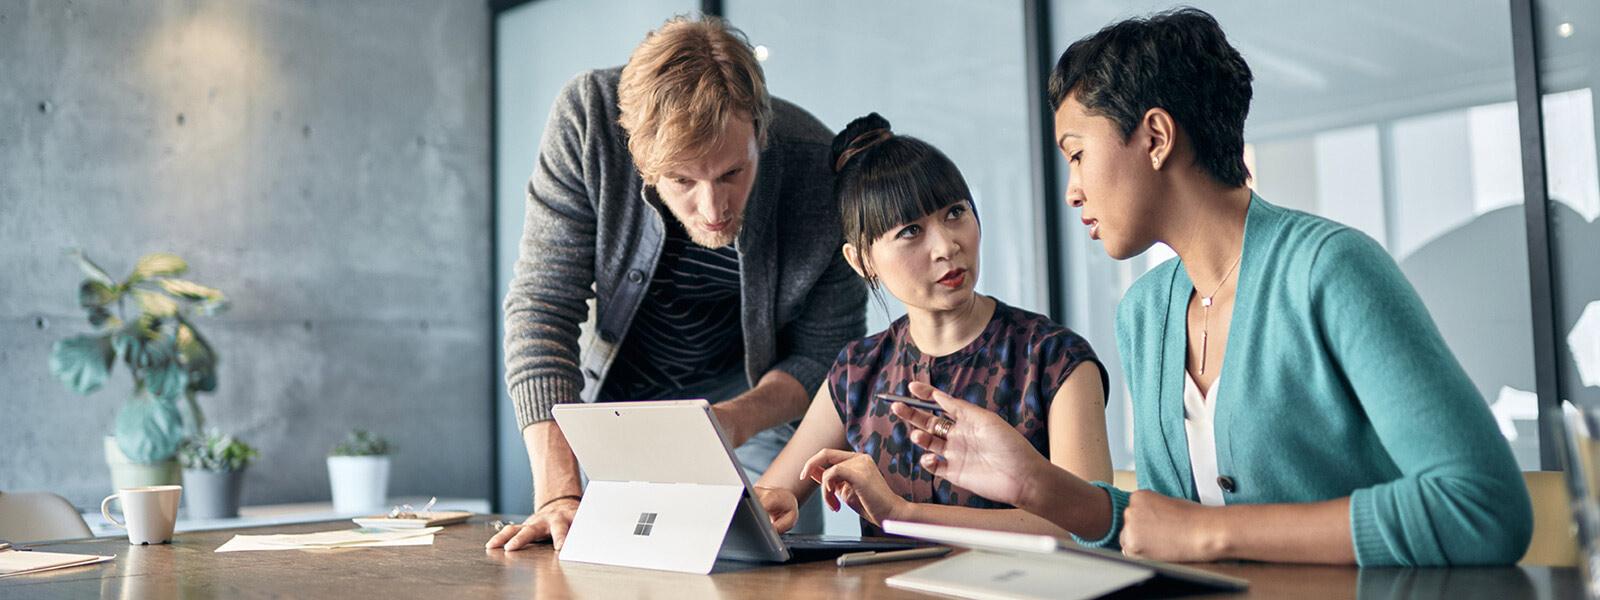 會議室有三個人看著 Surface Pro 4。